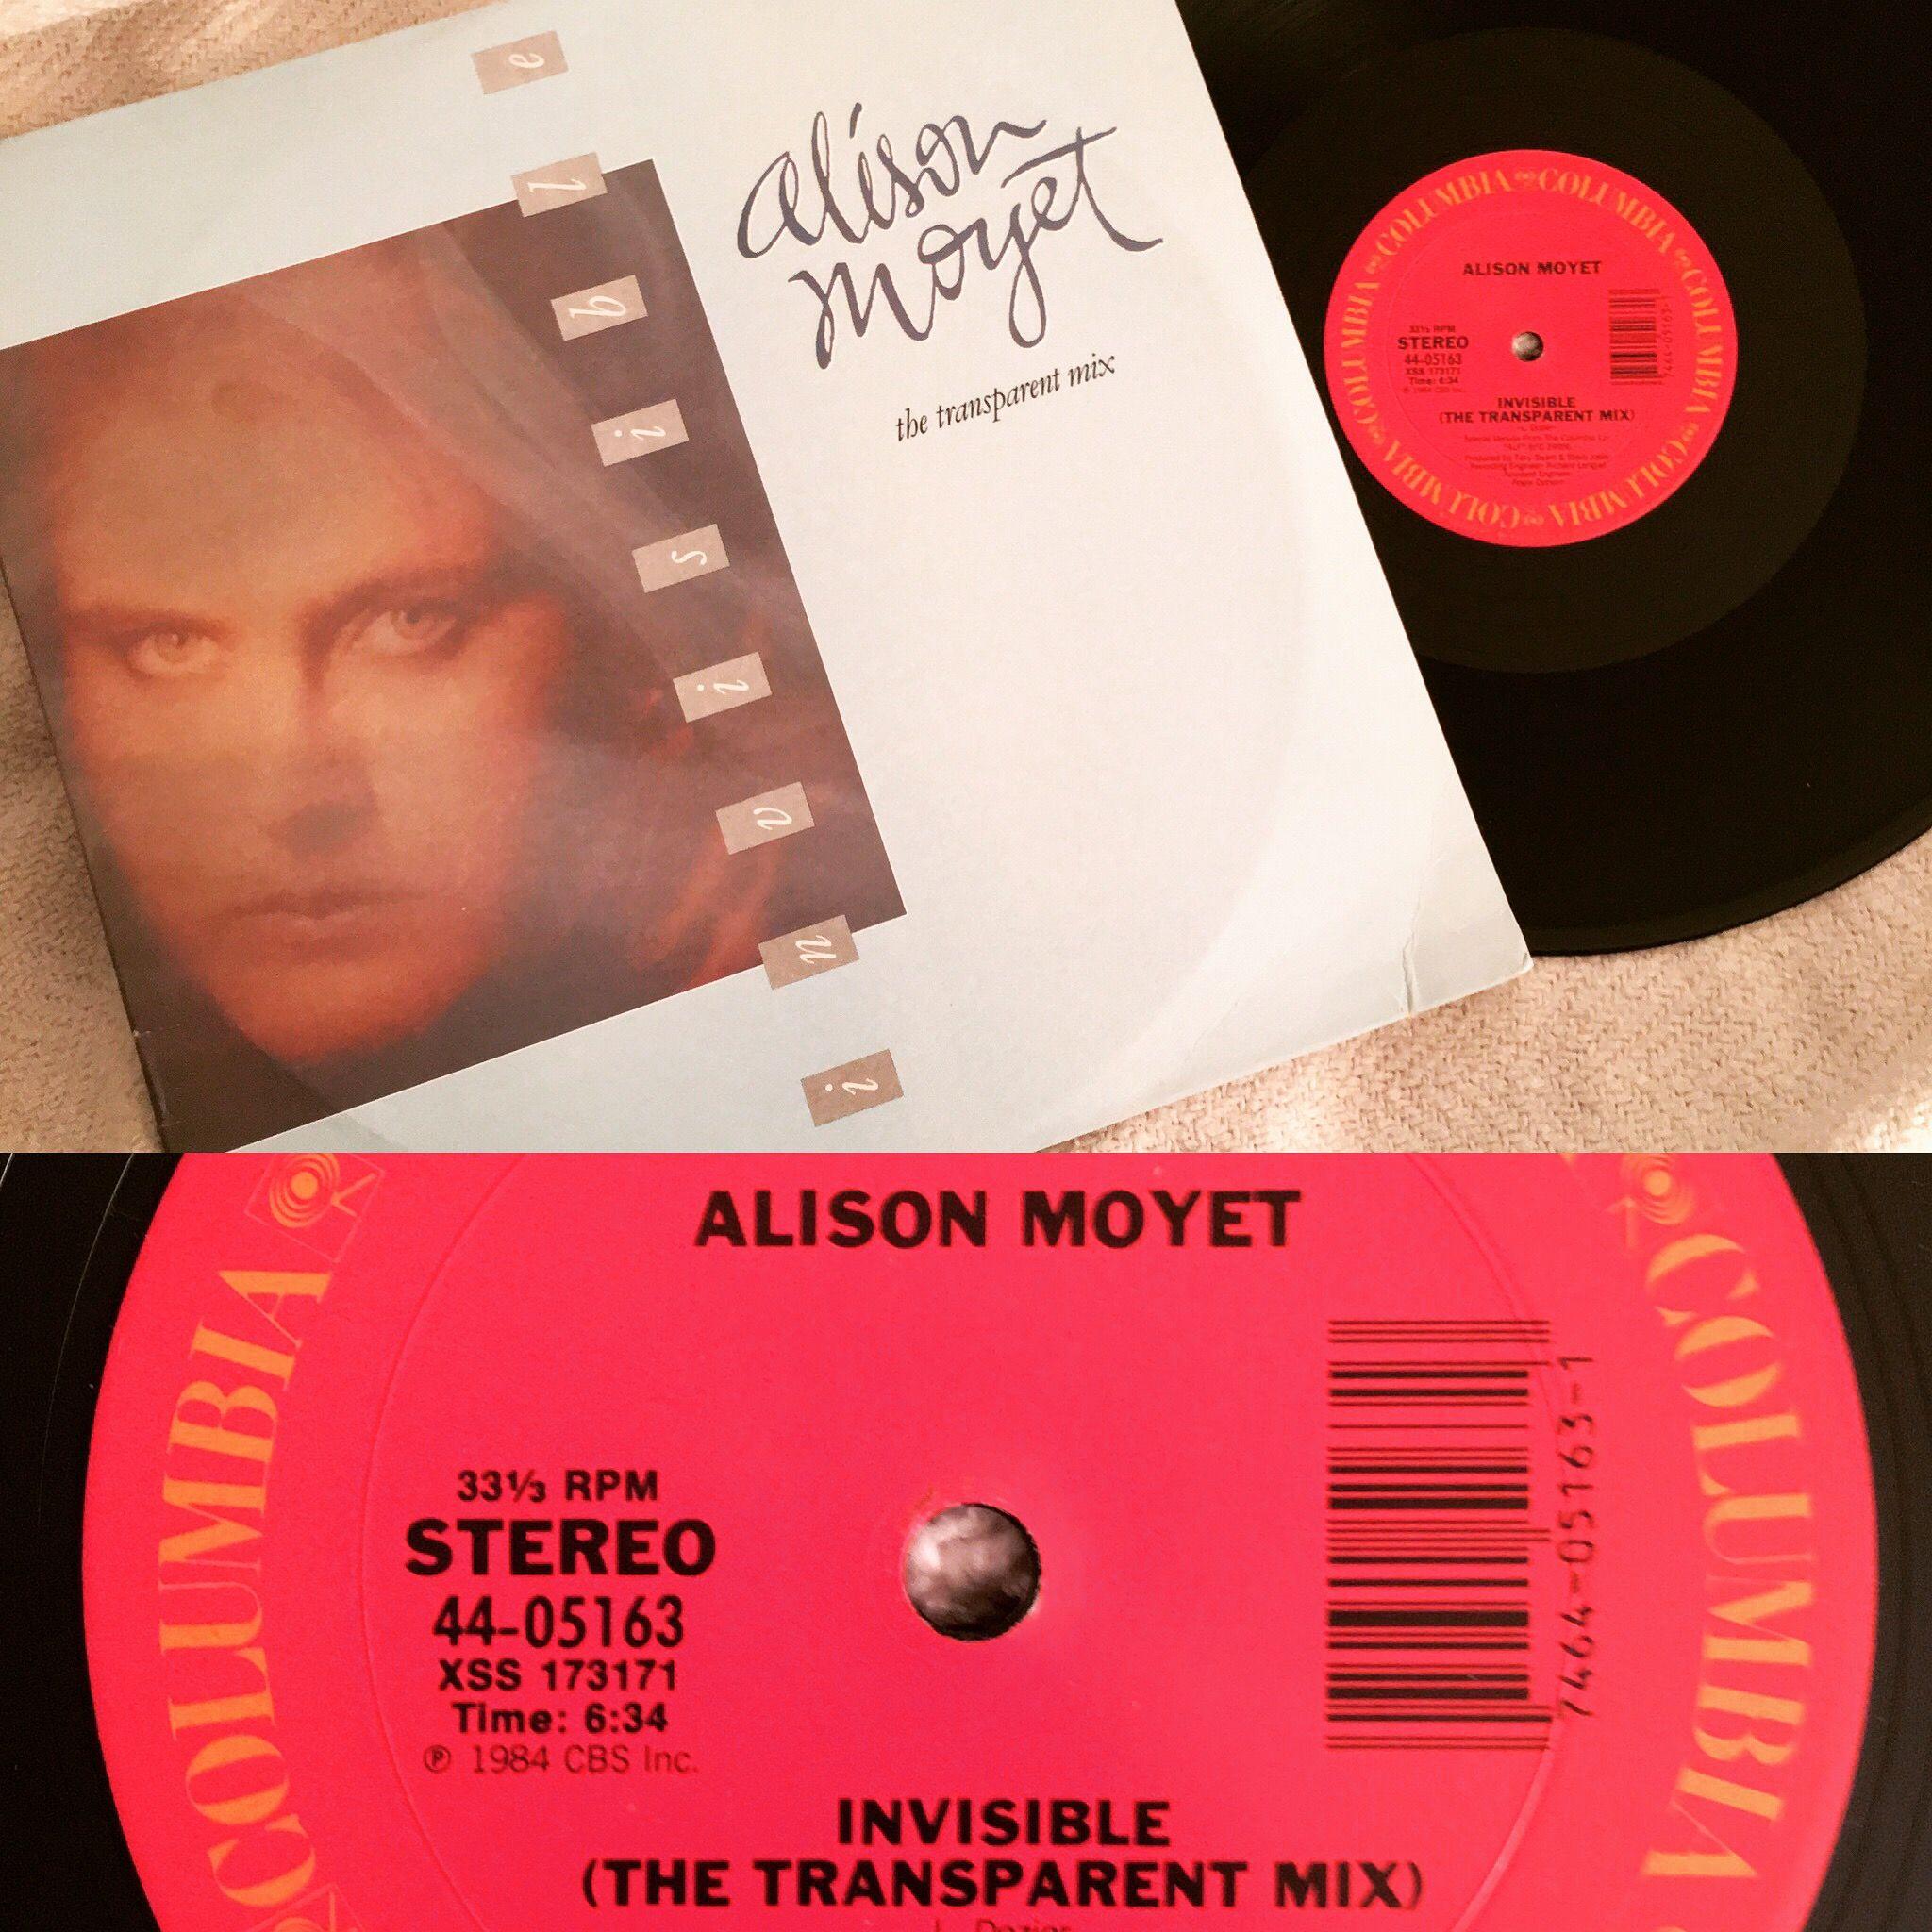 Alison Moyet Invisible The Transparent Mix 12 Inch Vinyl Single Alison Moyet